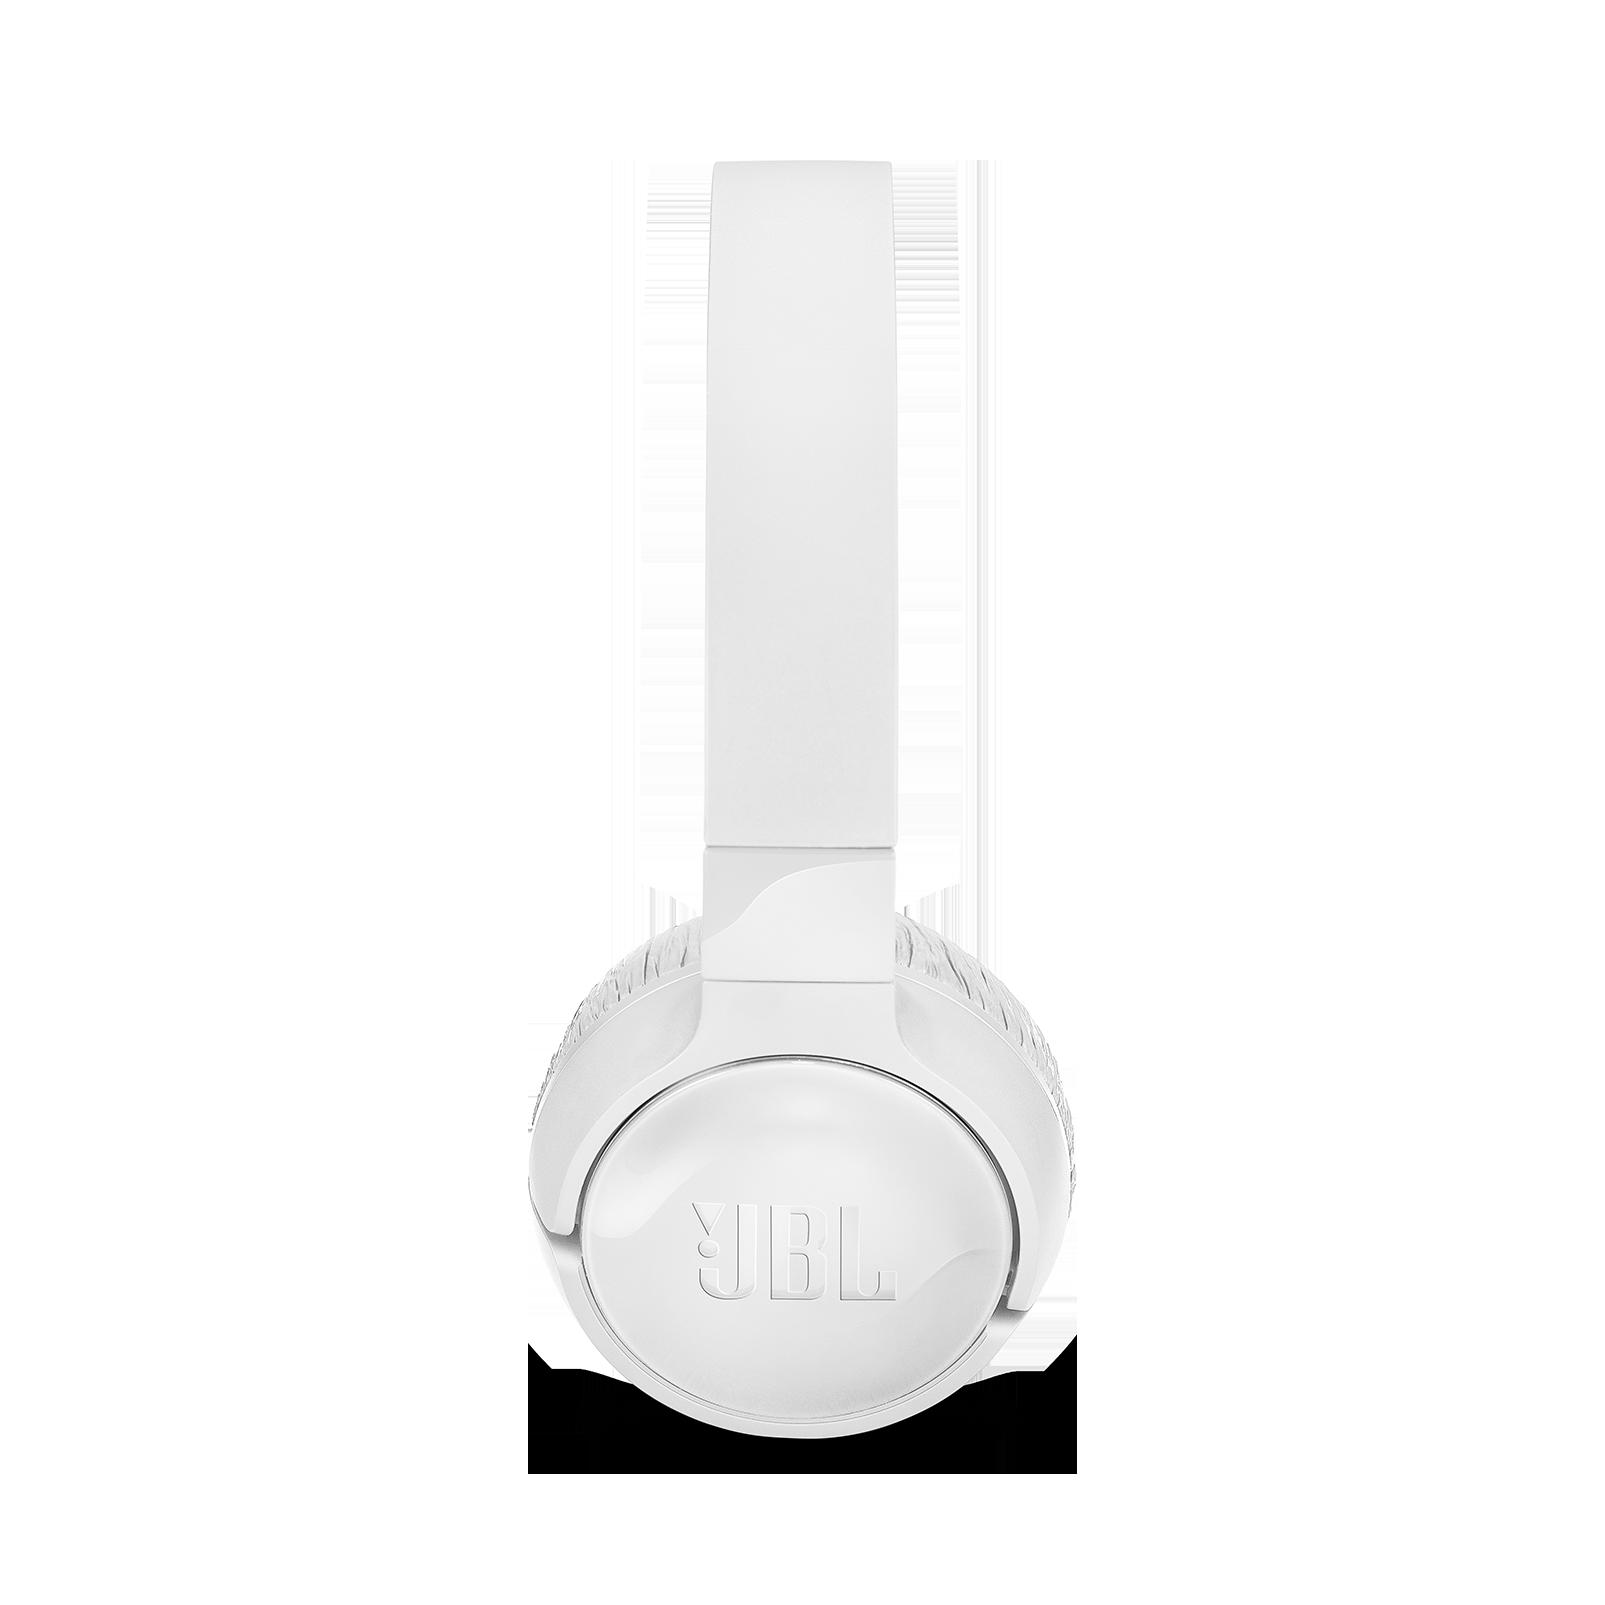 JBL TUNE 600BTNC - White - Wireless, on-ear, active noise-cancelling headphones. - Left